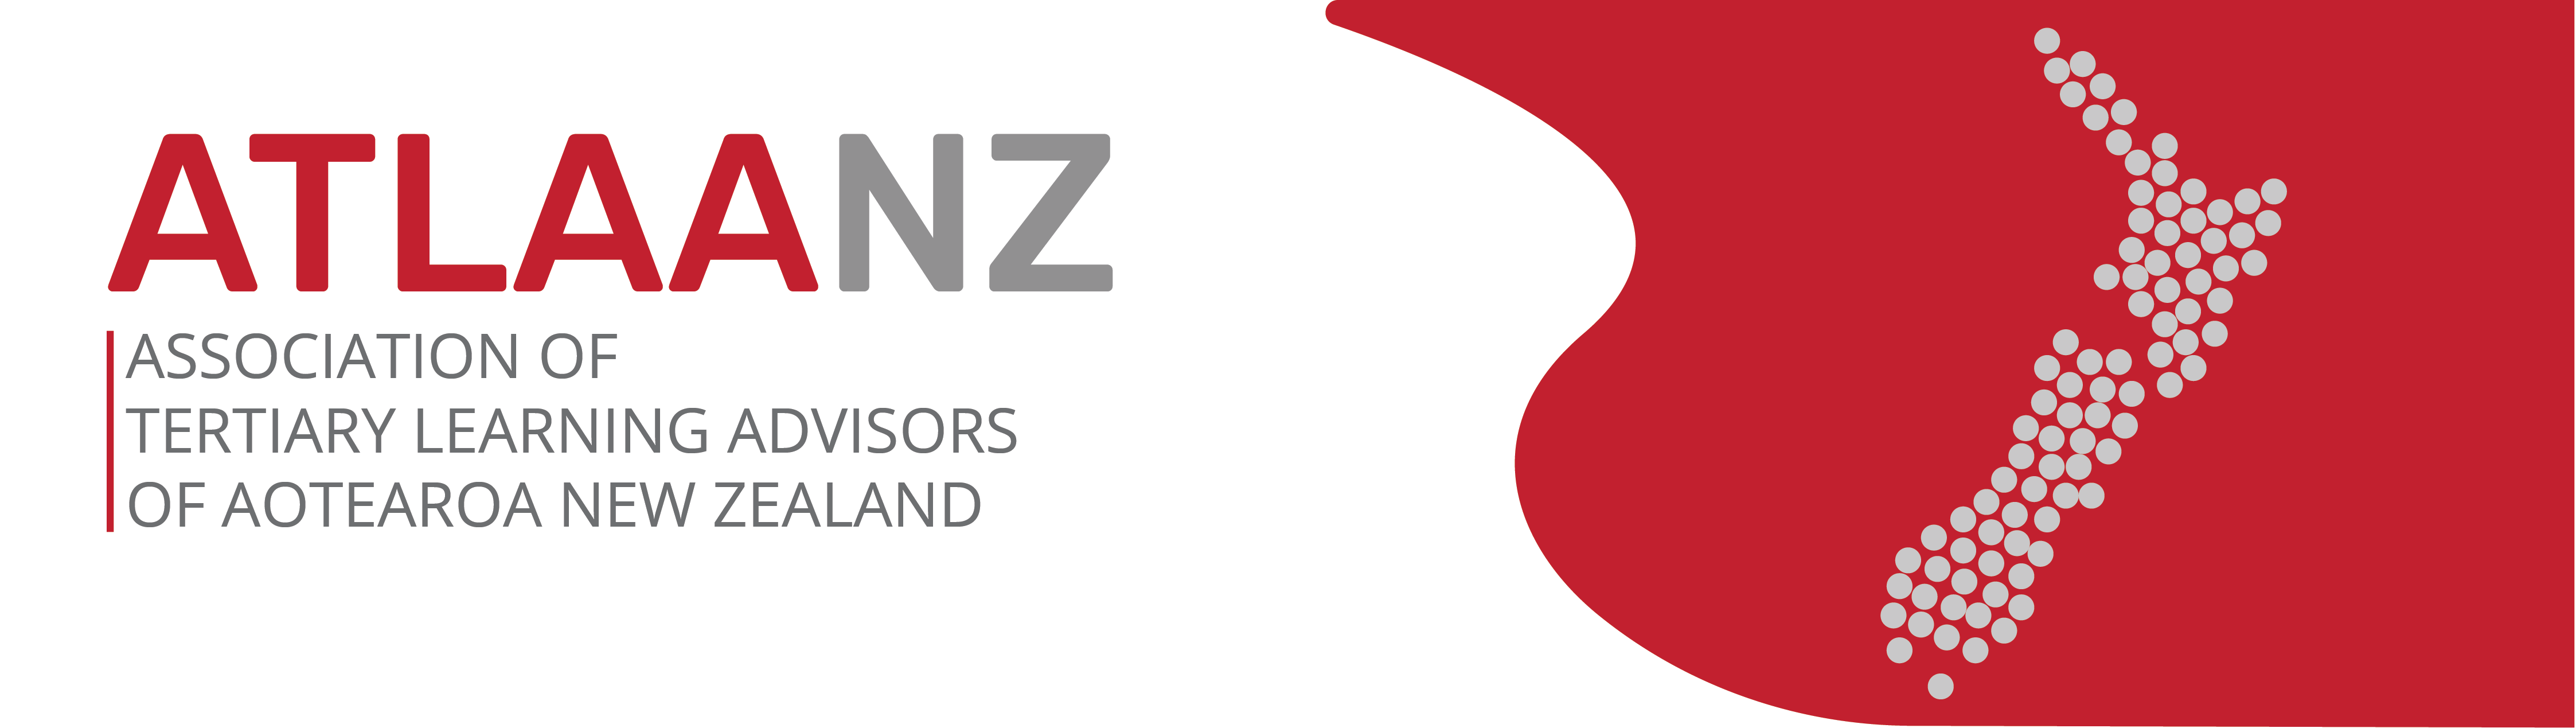 Logo for Association of Tertiary Learning Advisors Aotearoa/New Zealand, representing map of New Zealand